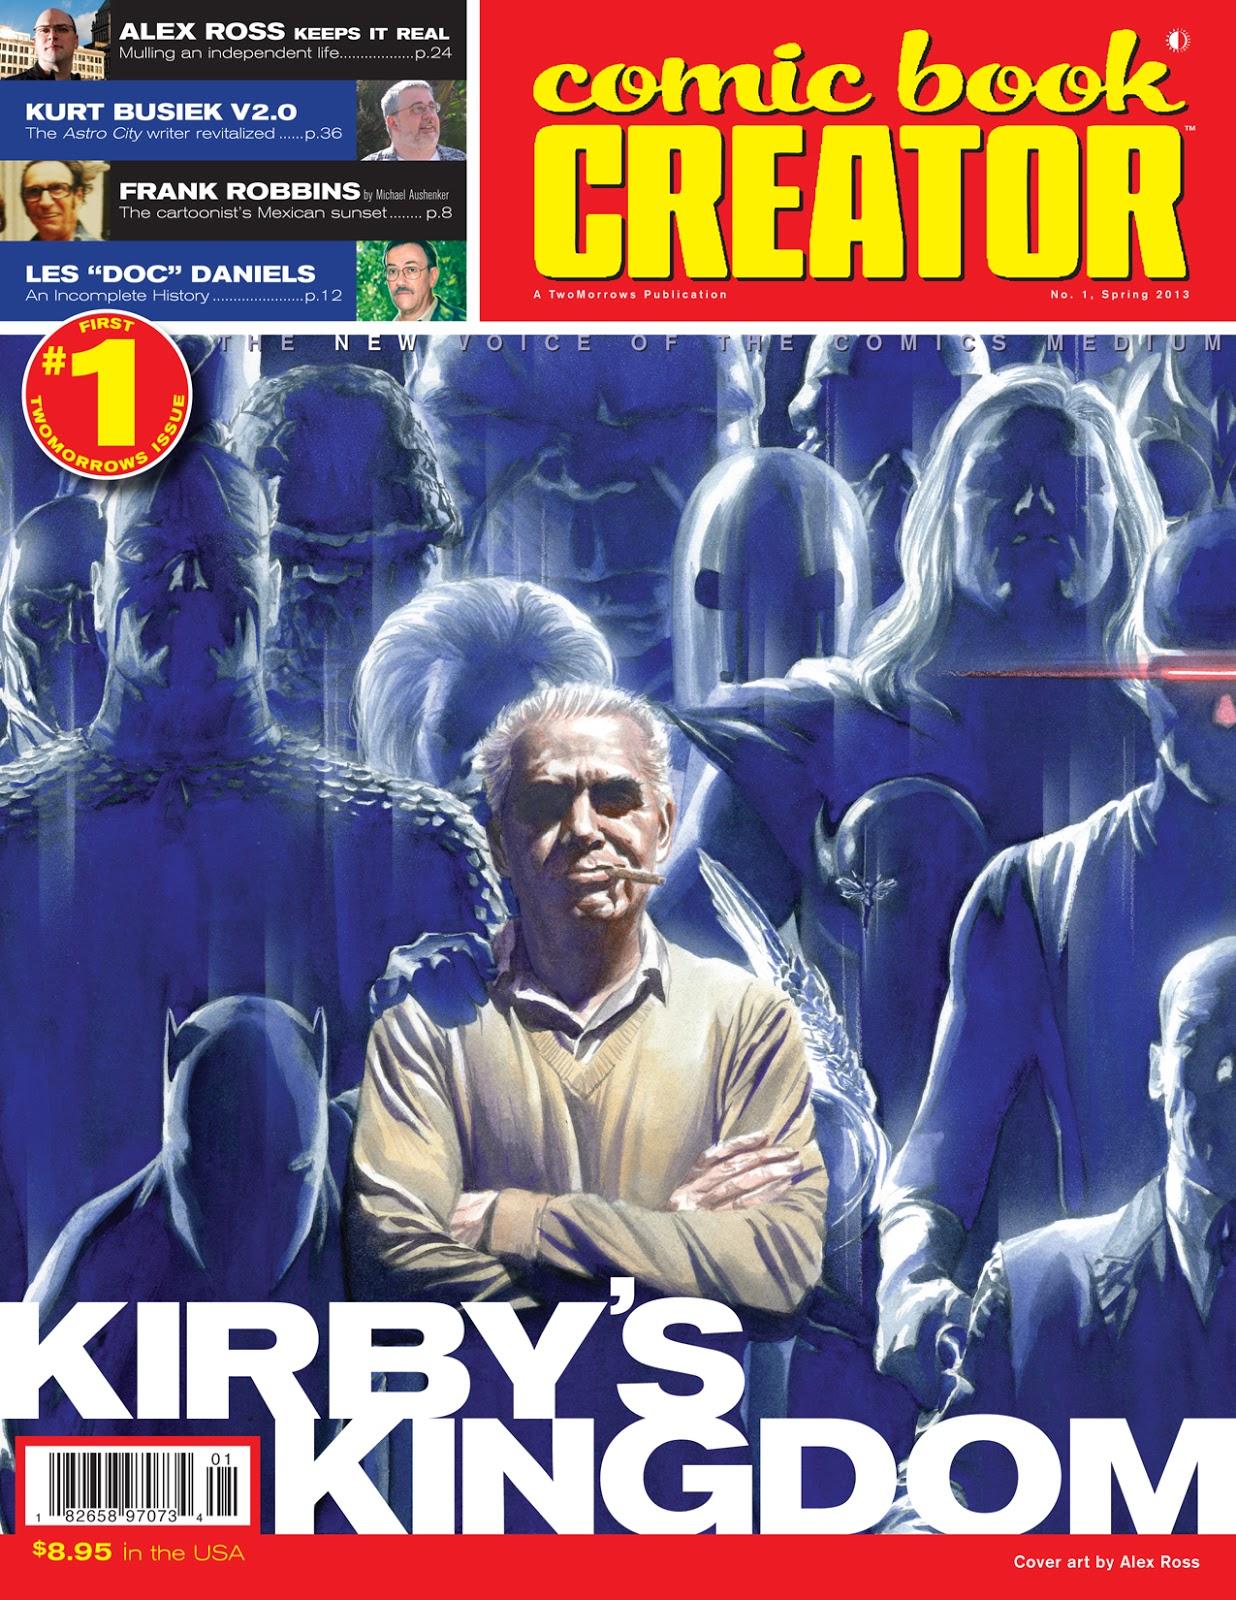 Michael Aushenker S Cartoon Flophouse King Kirby Frank